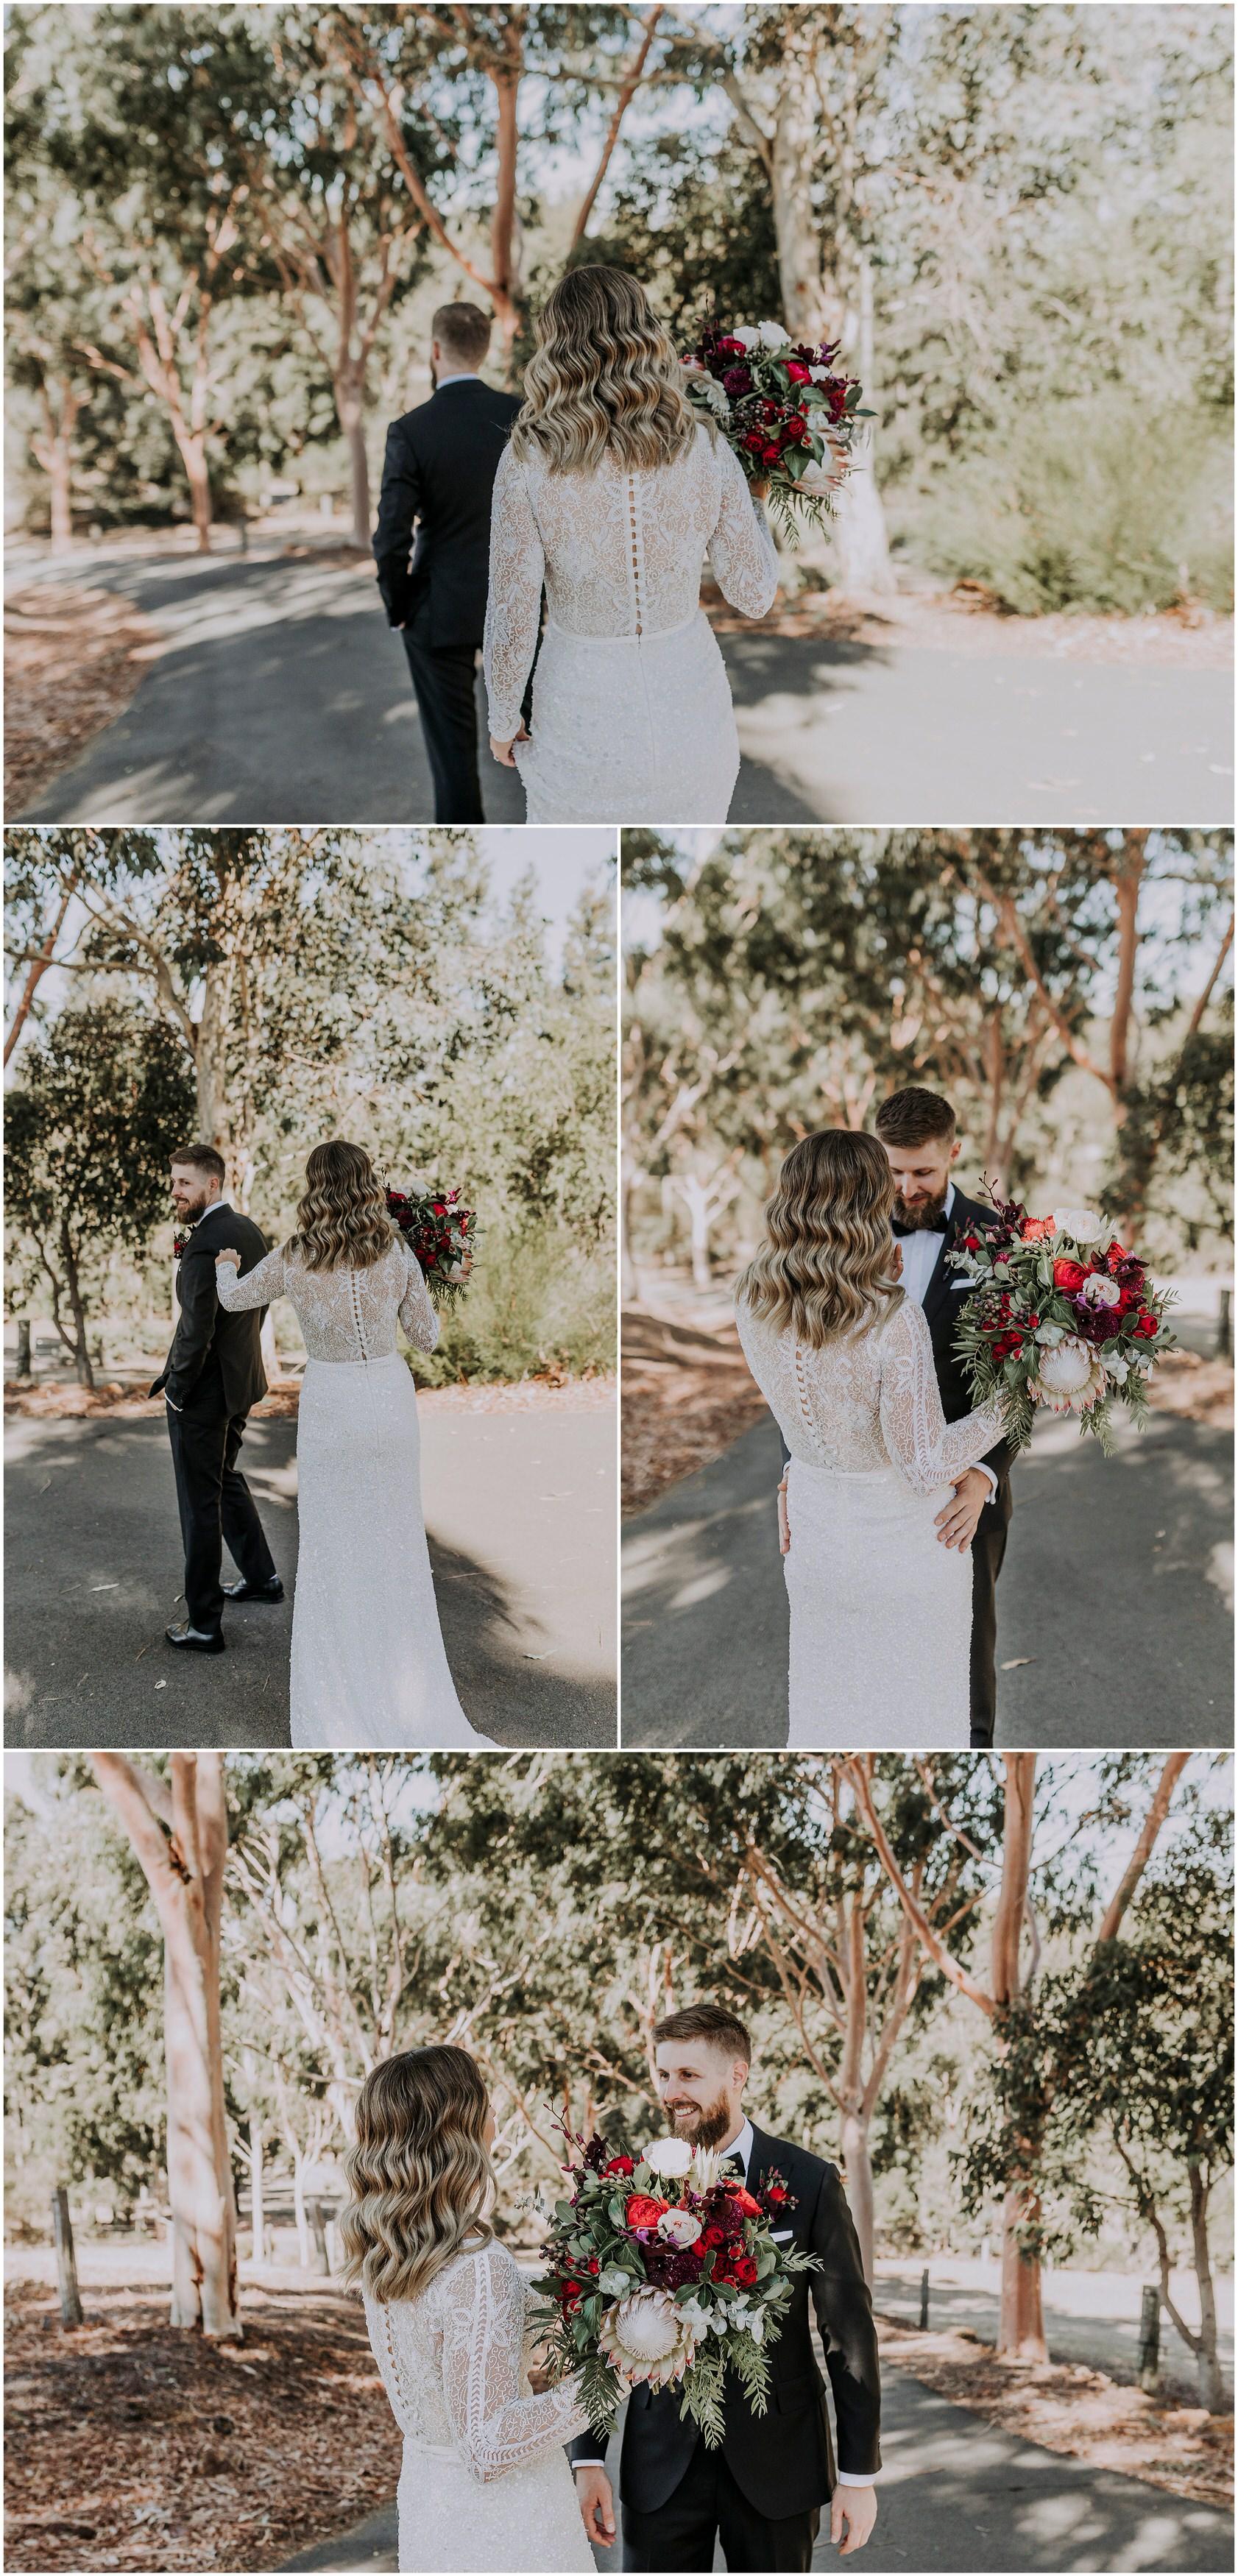 ferguson_valley_perth_wedding_photgorapher_keeper_creative_10.JPG